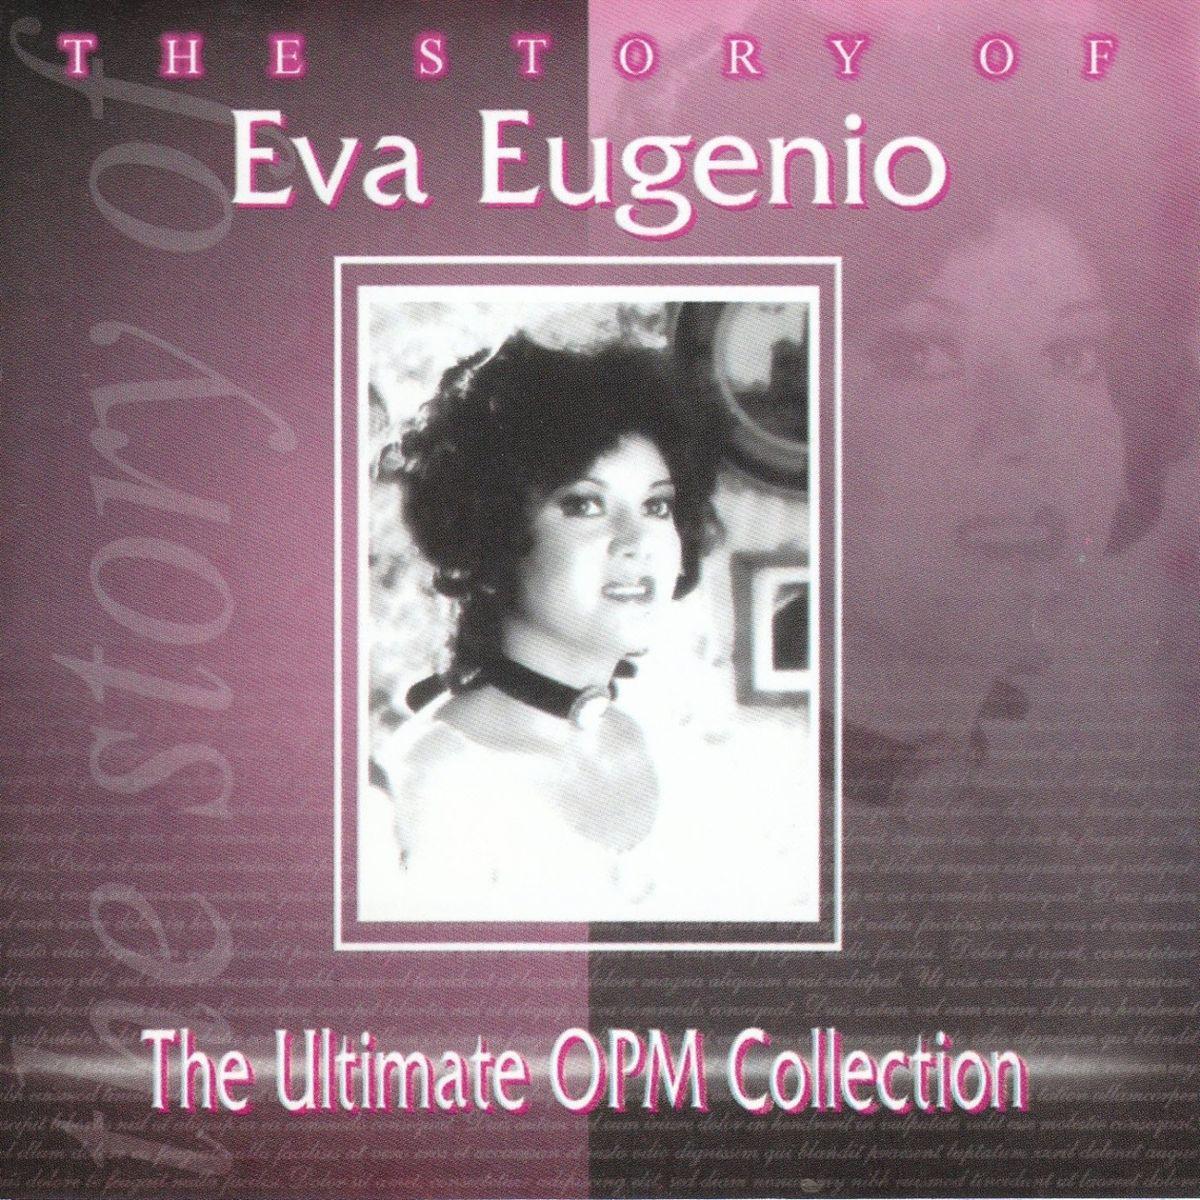 Eva Eugenio (b. ?) nudes (41 foto and video), Tits, Hot, Selfie, butt 2006